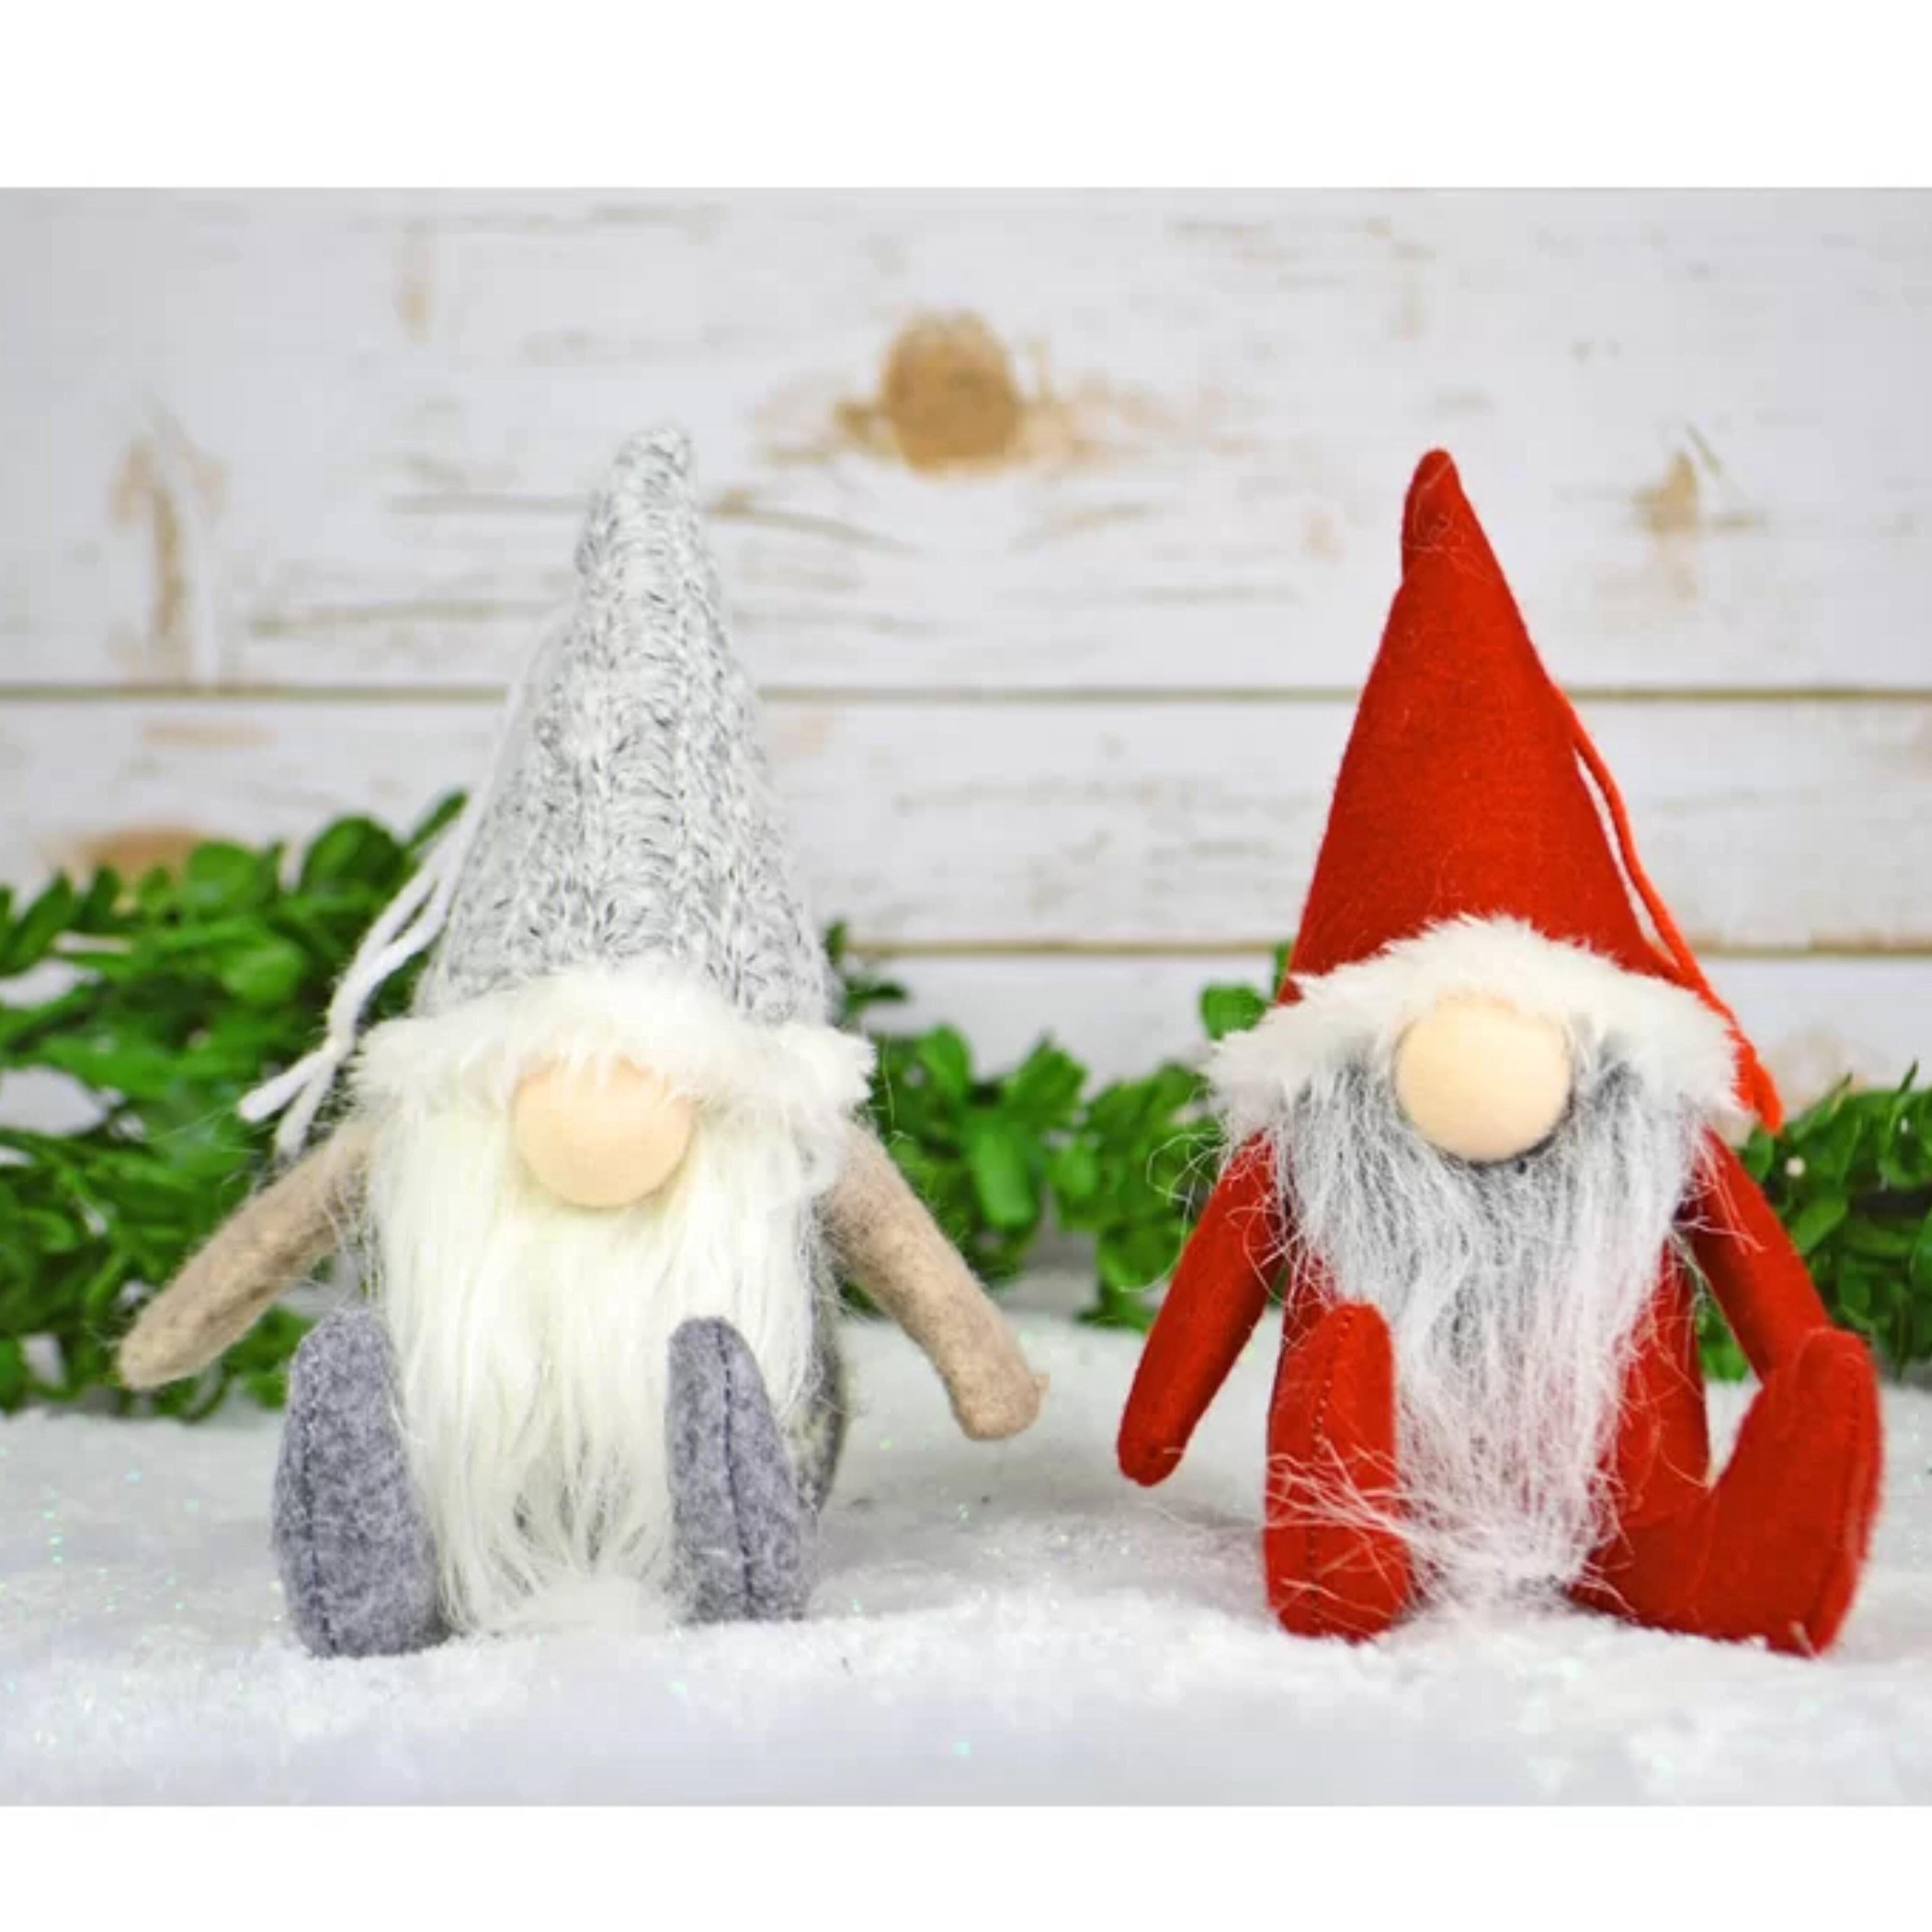 The Holiday Aisle 2 Piece Aksel Baileysmall Fabric Gnome Hanging Fugurine Ornament Set Wayfair